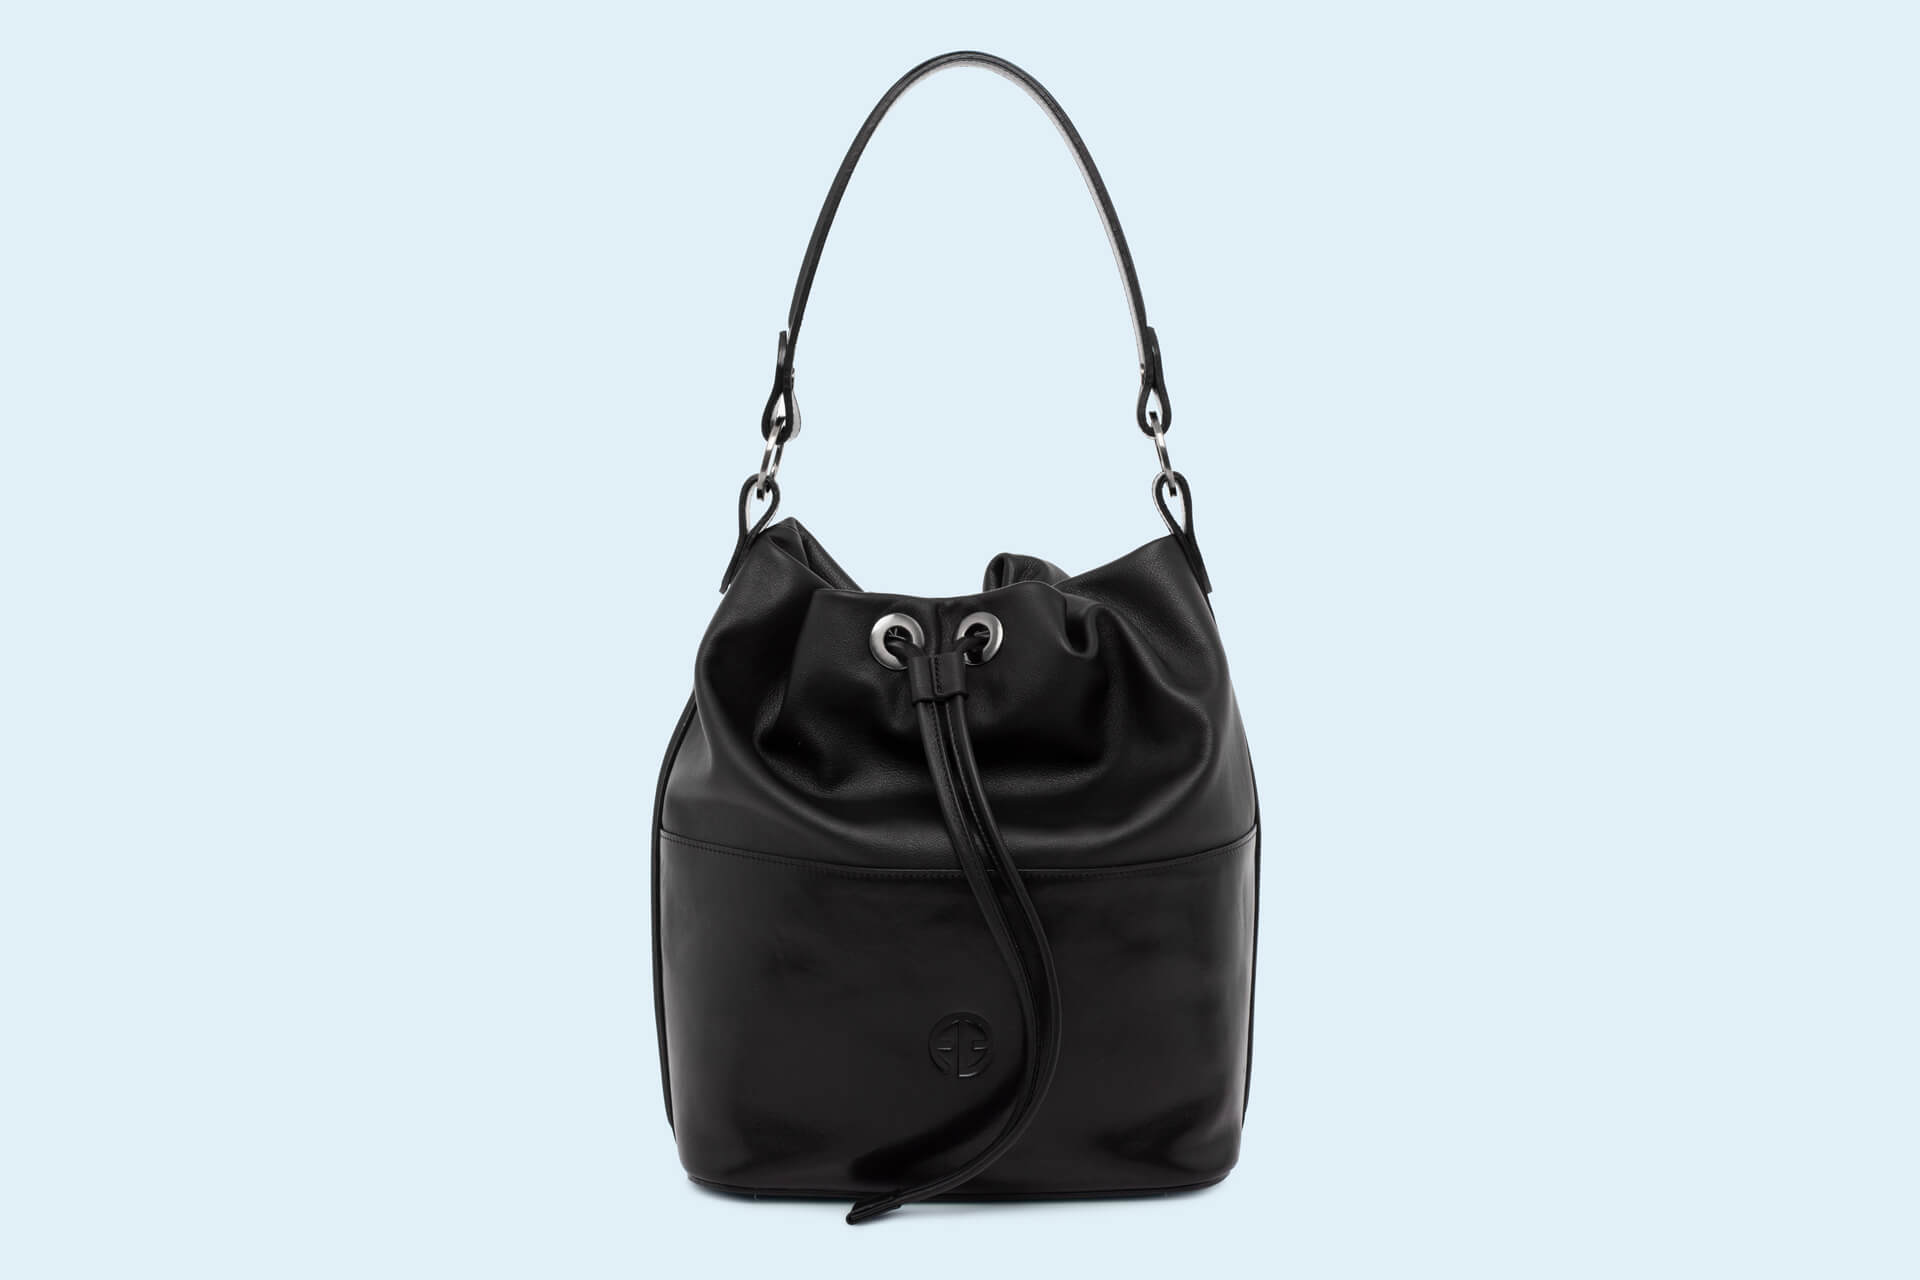 1e1c96915082f Torebka damska worek - Verity Bucket bag black/black   ADAM BARON